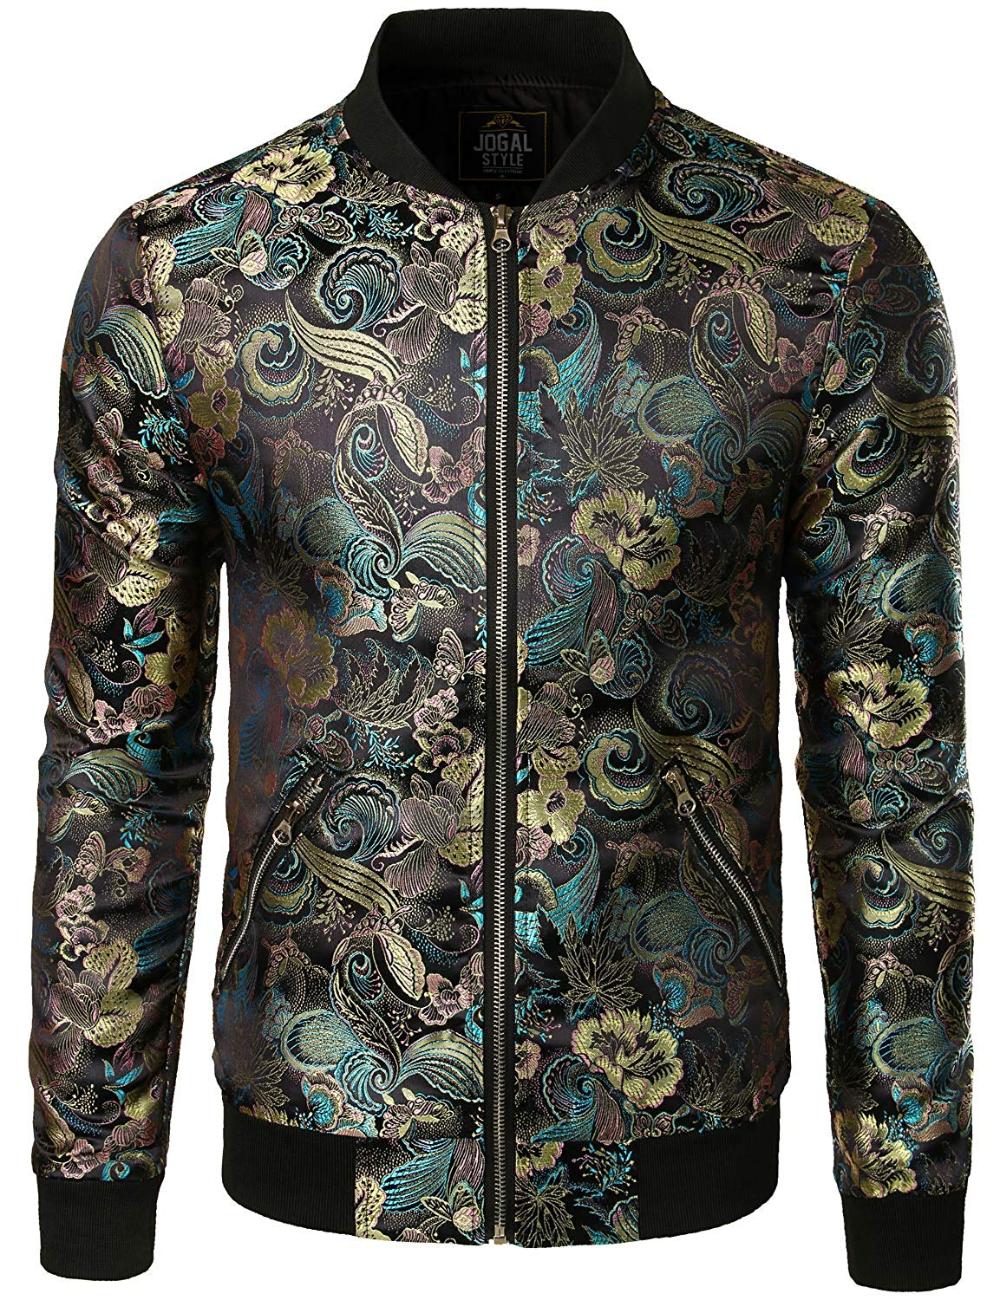 Jogal Men S Luxury Paisley Embroidered Satin Bomber Jacket Coat At Amazon Men S Clothing Store Satin Bomber Jacket Men S Coats And Jackets Mens Luxury [ 1300 x 1000 Pixel ]